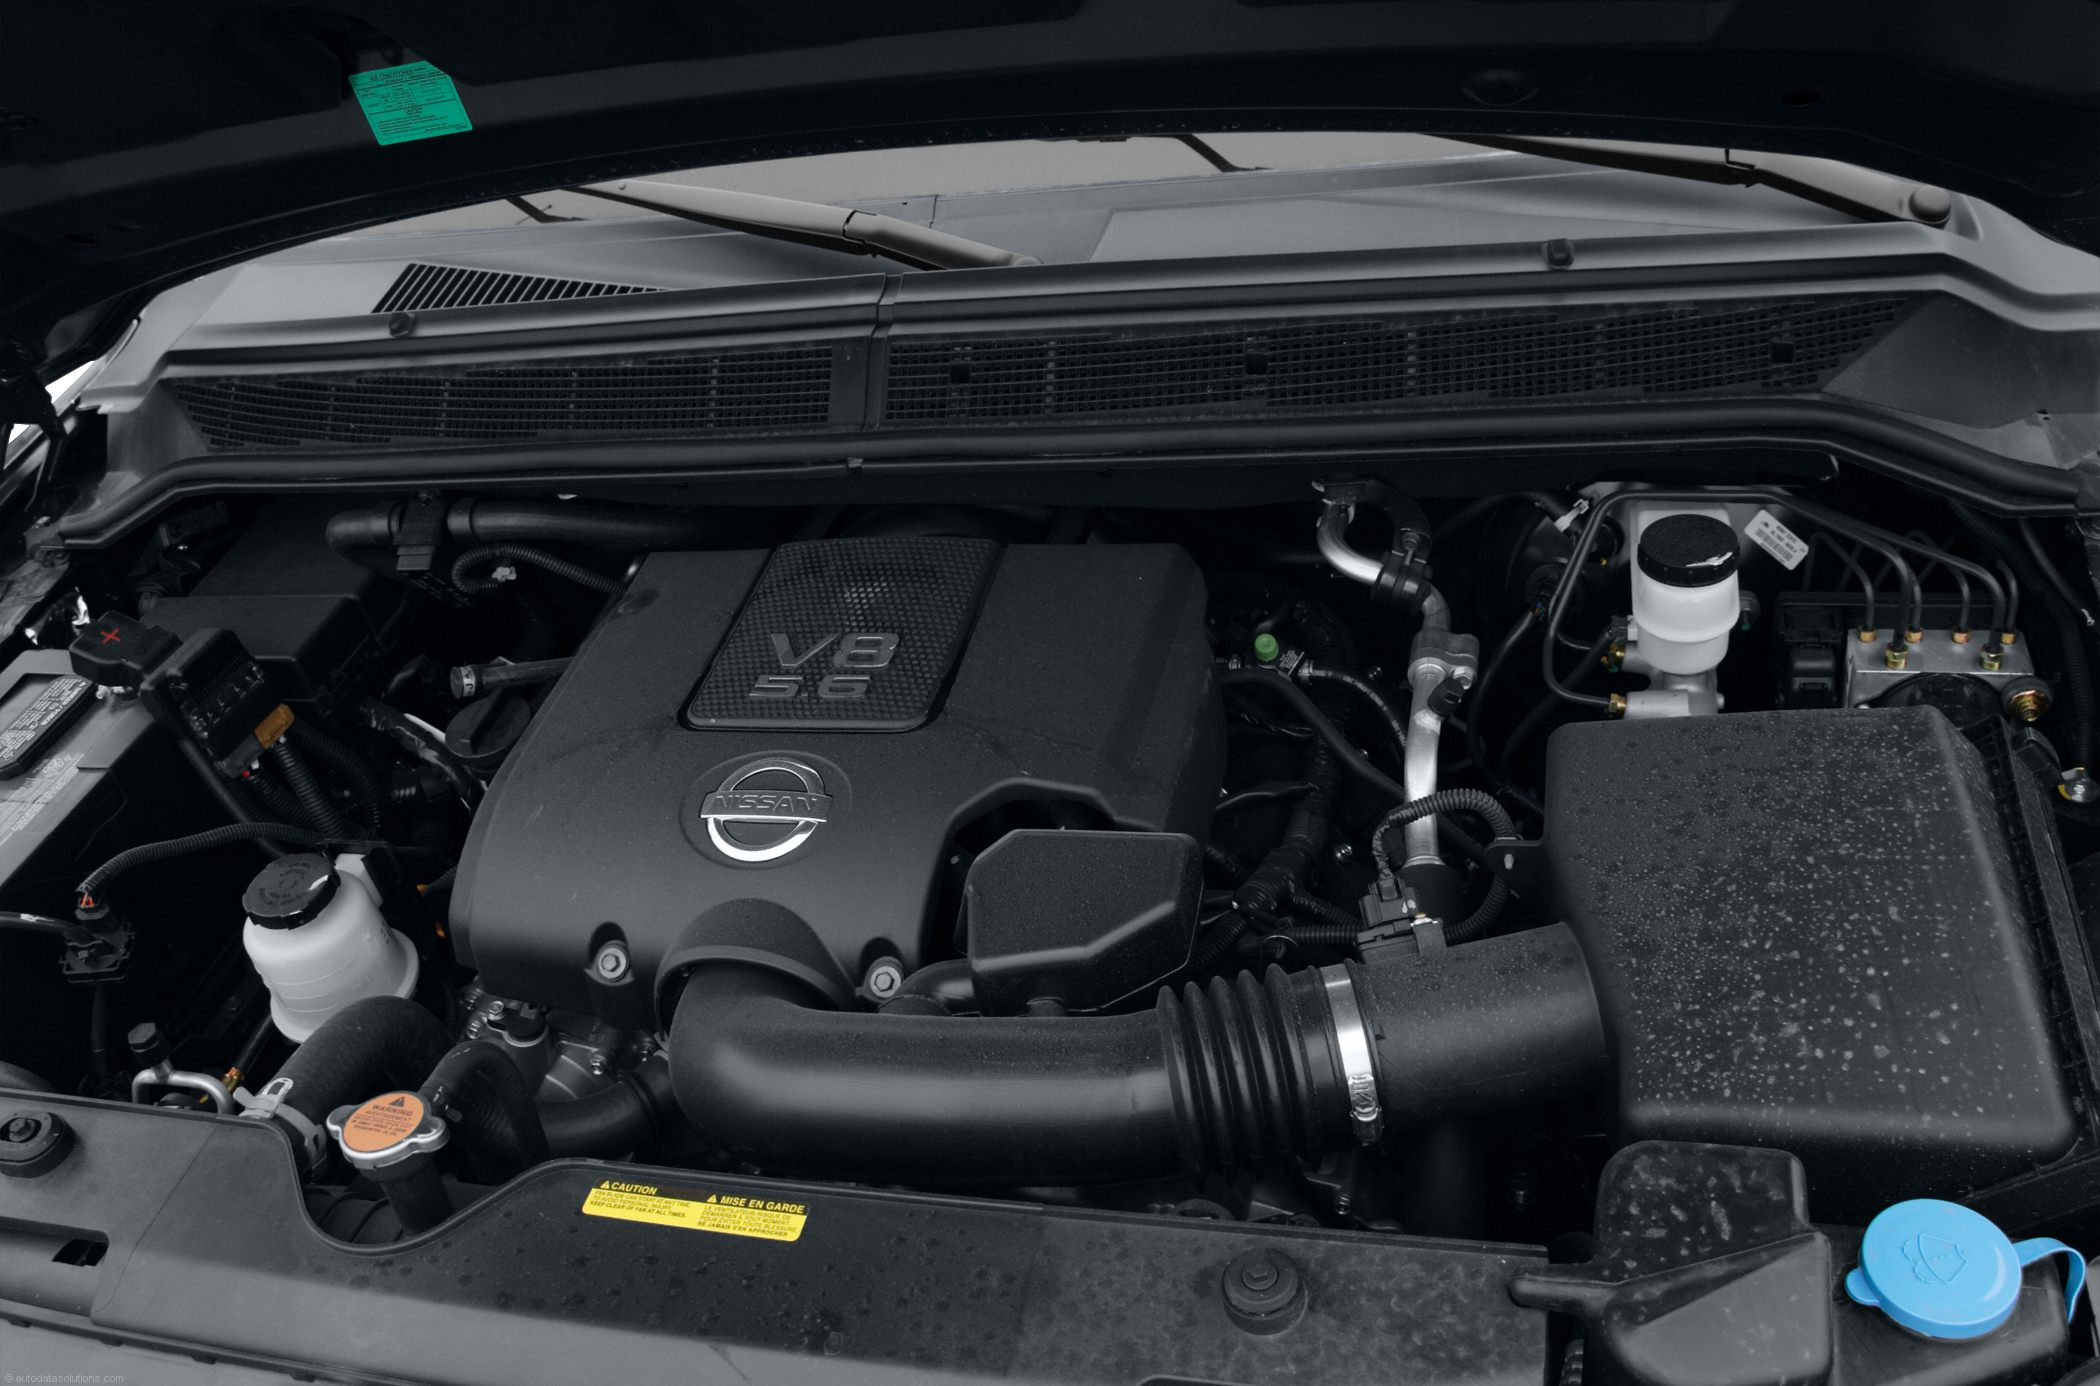 2010 Nissan Titan Review | The Maguire Auto Blog